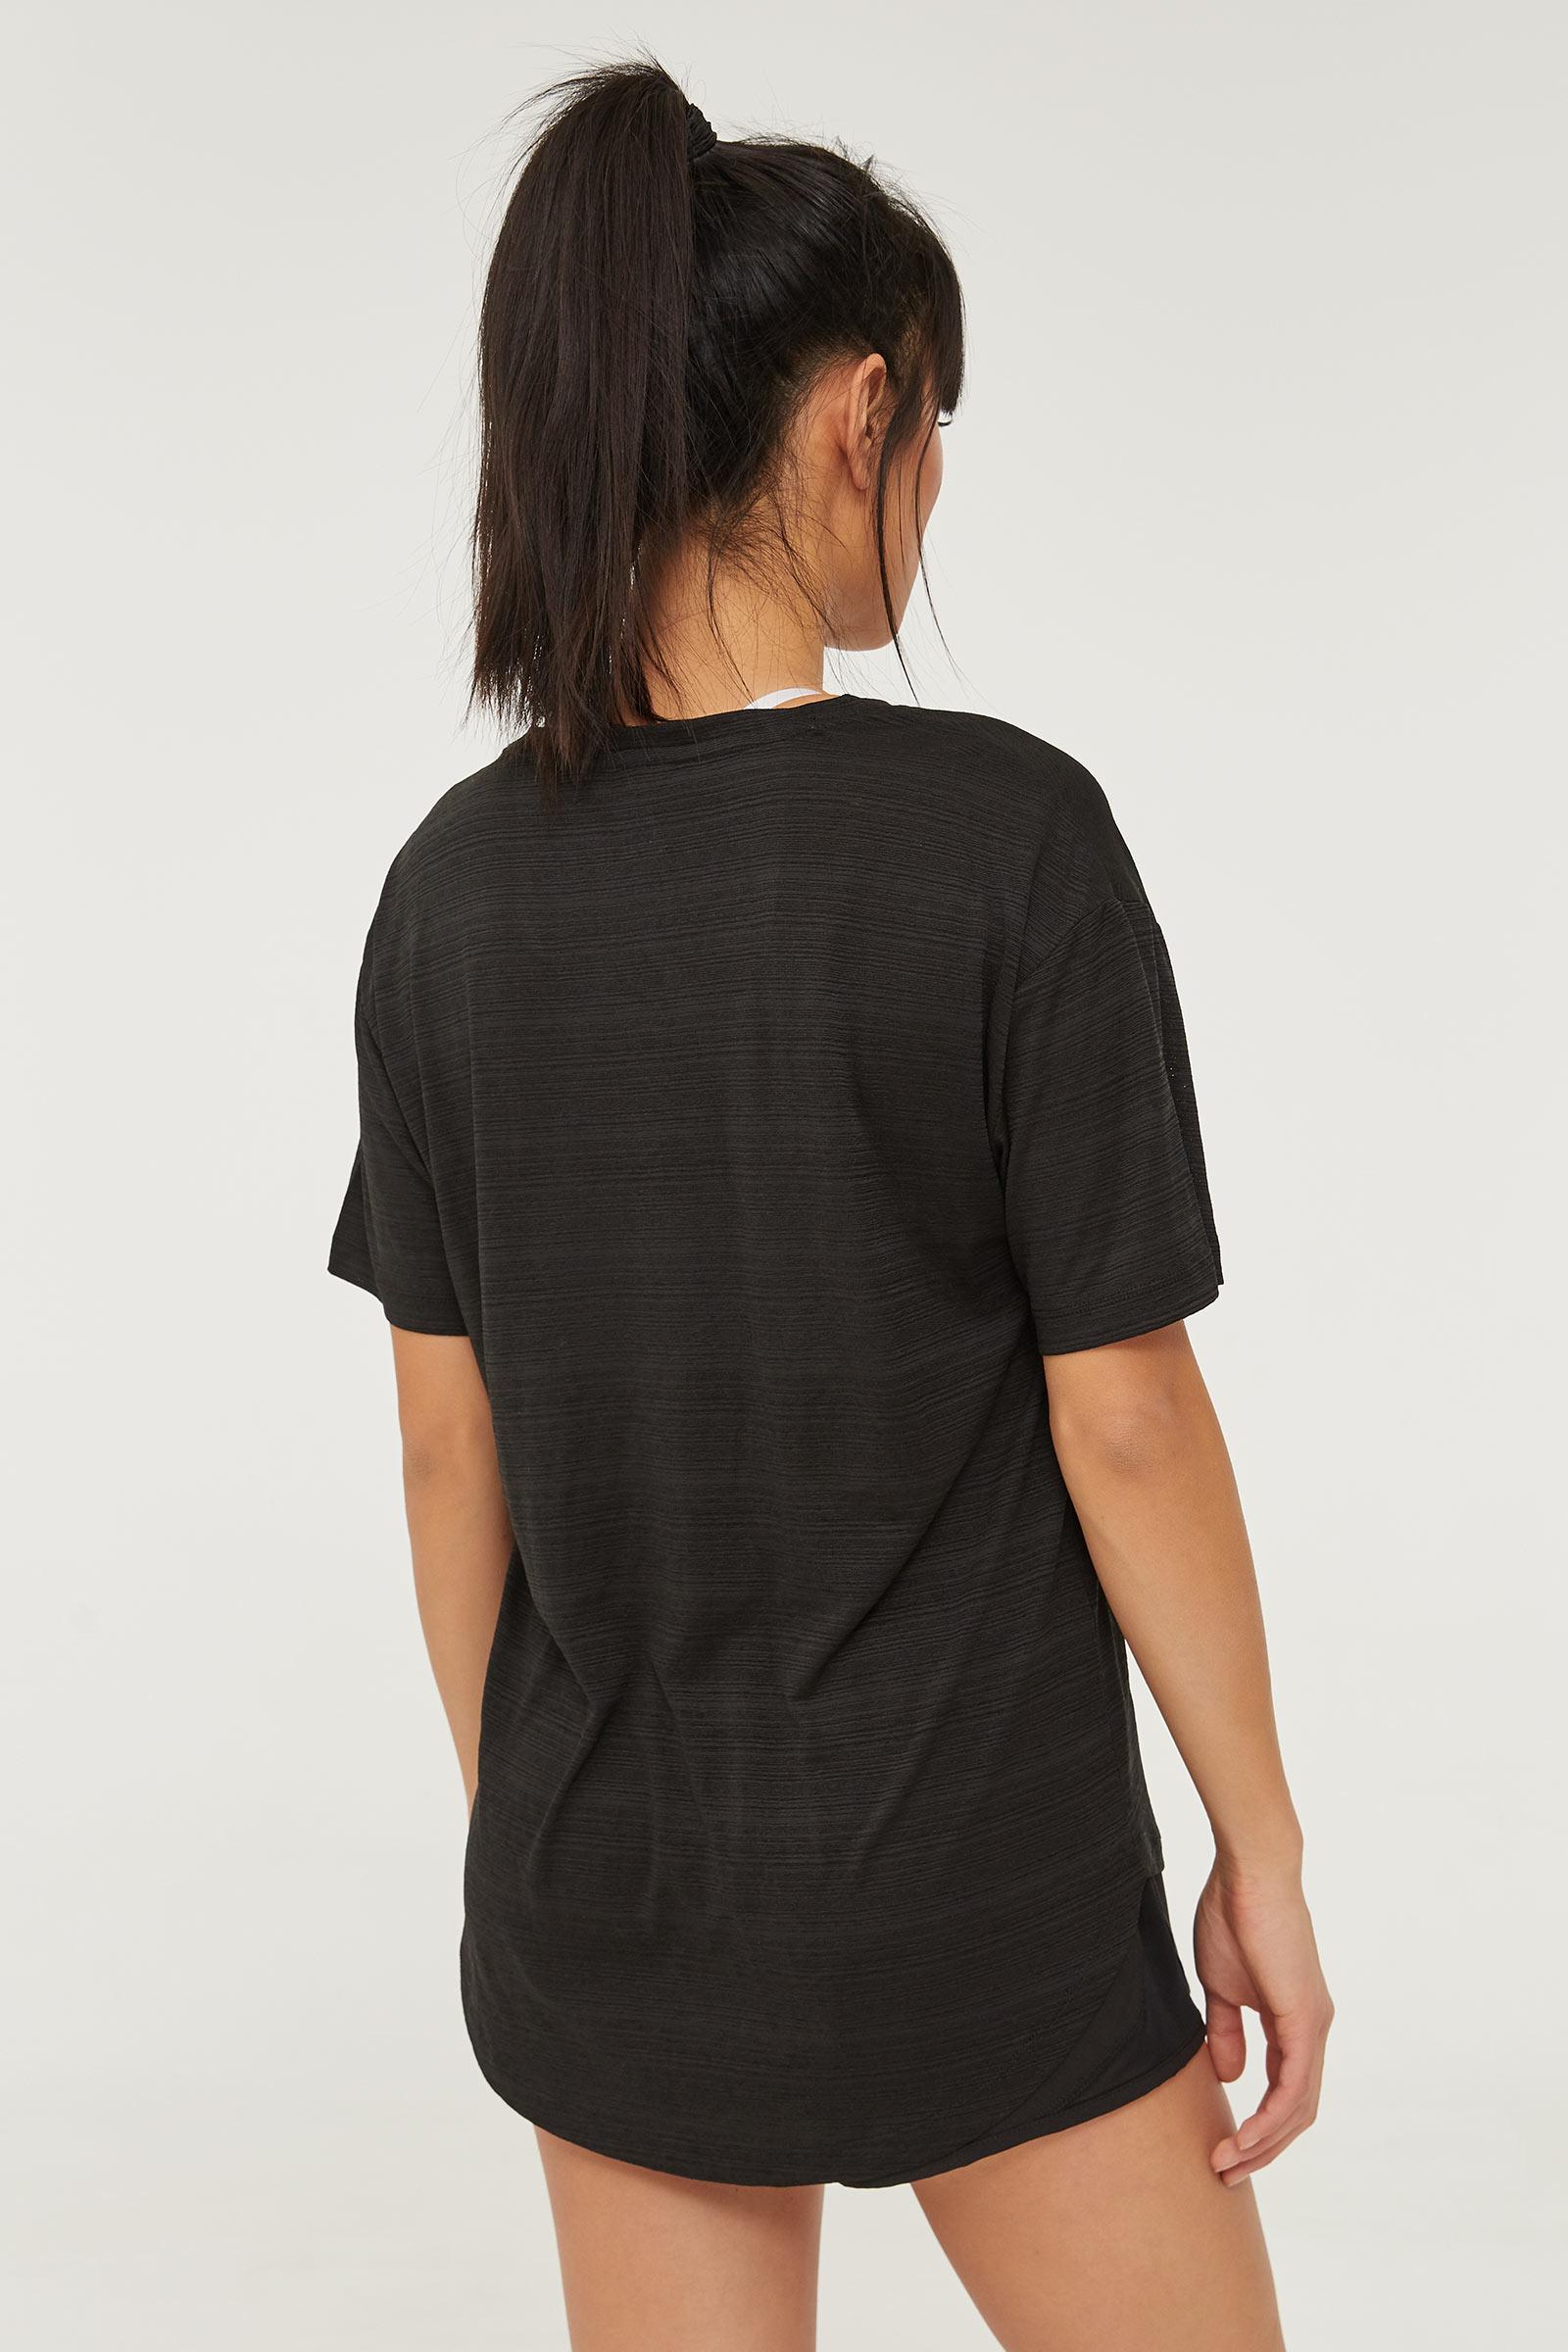 MOVE Activewear T-shirt